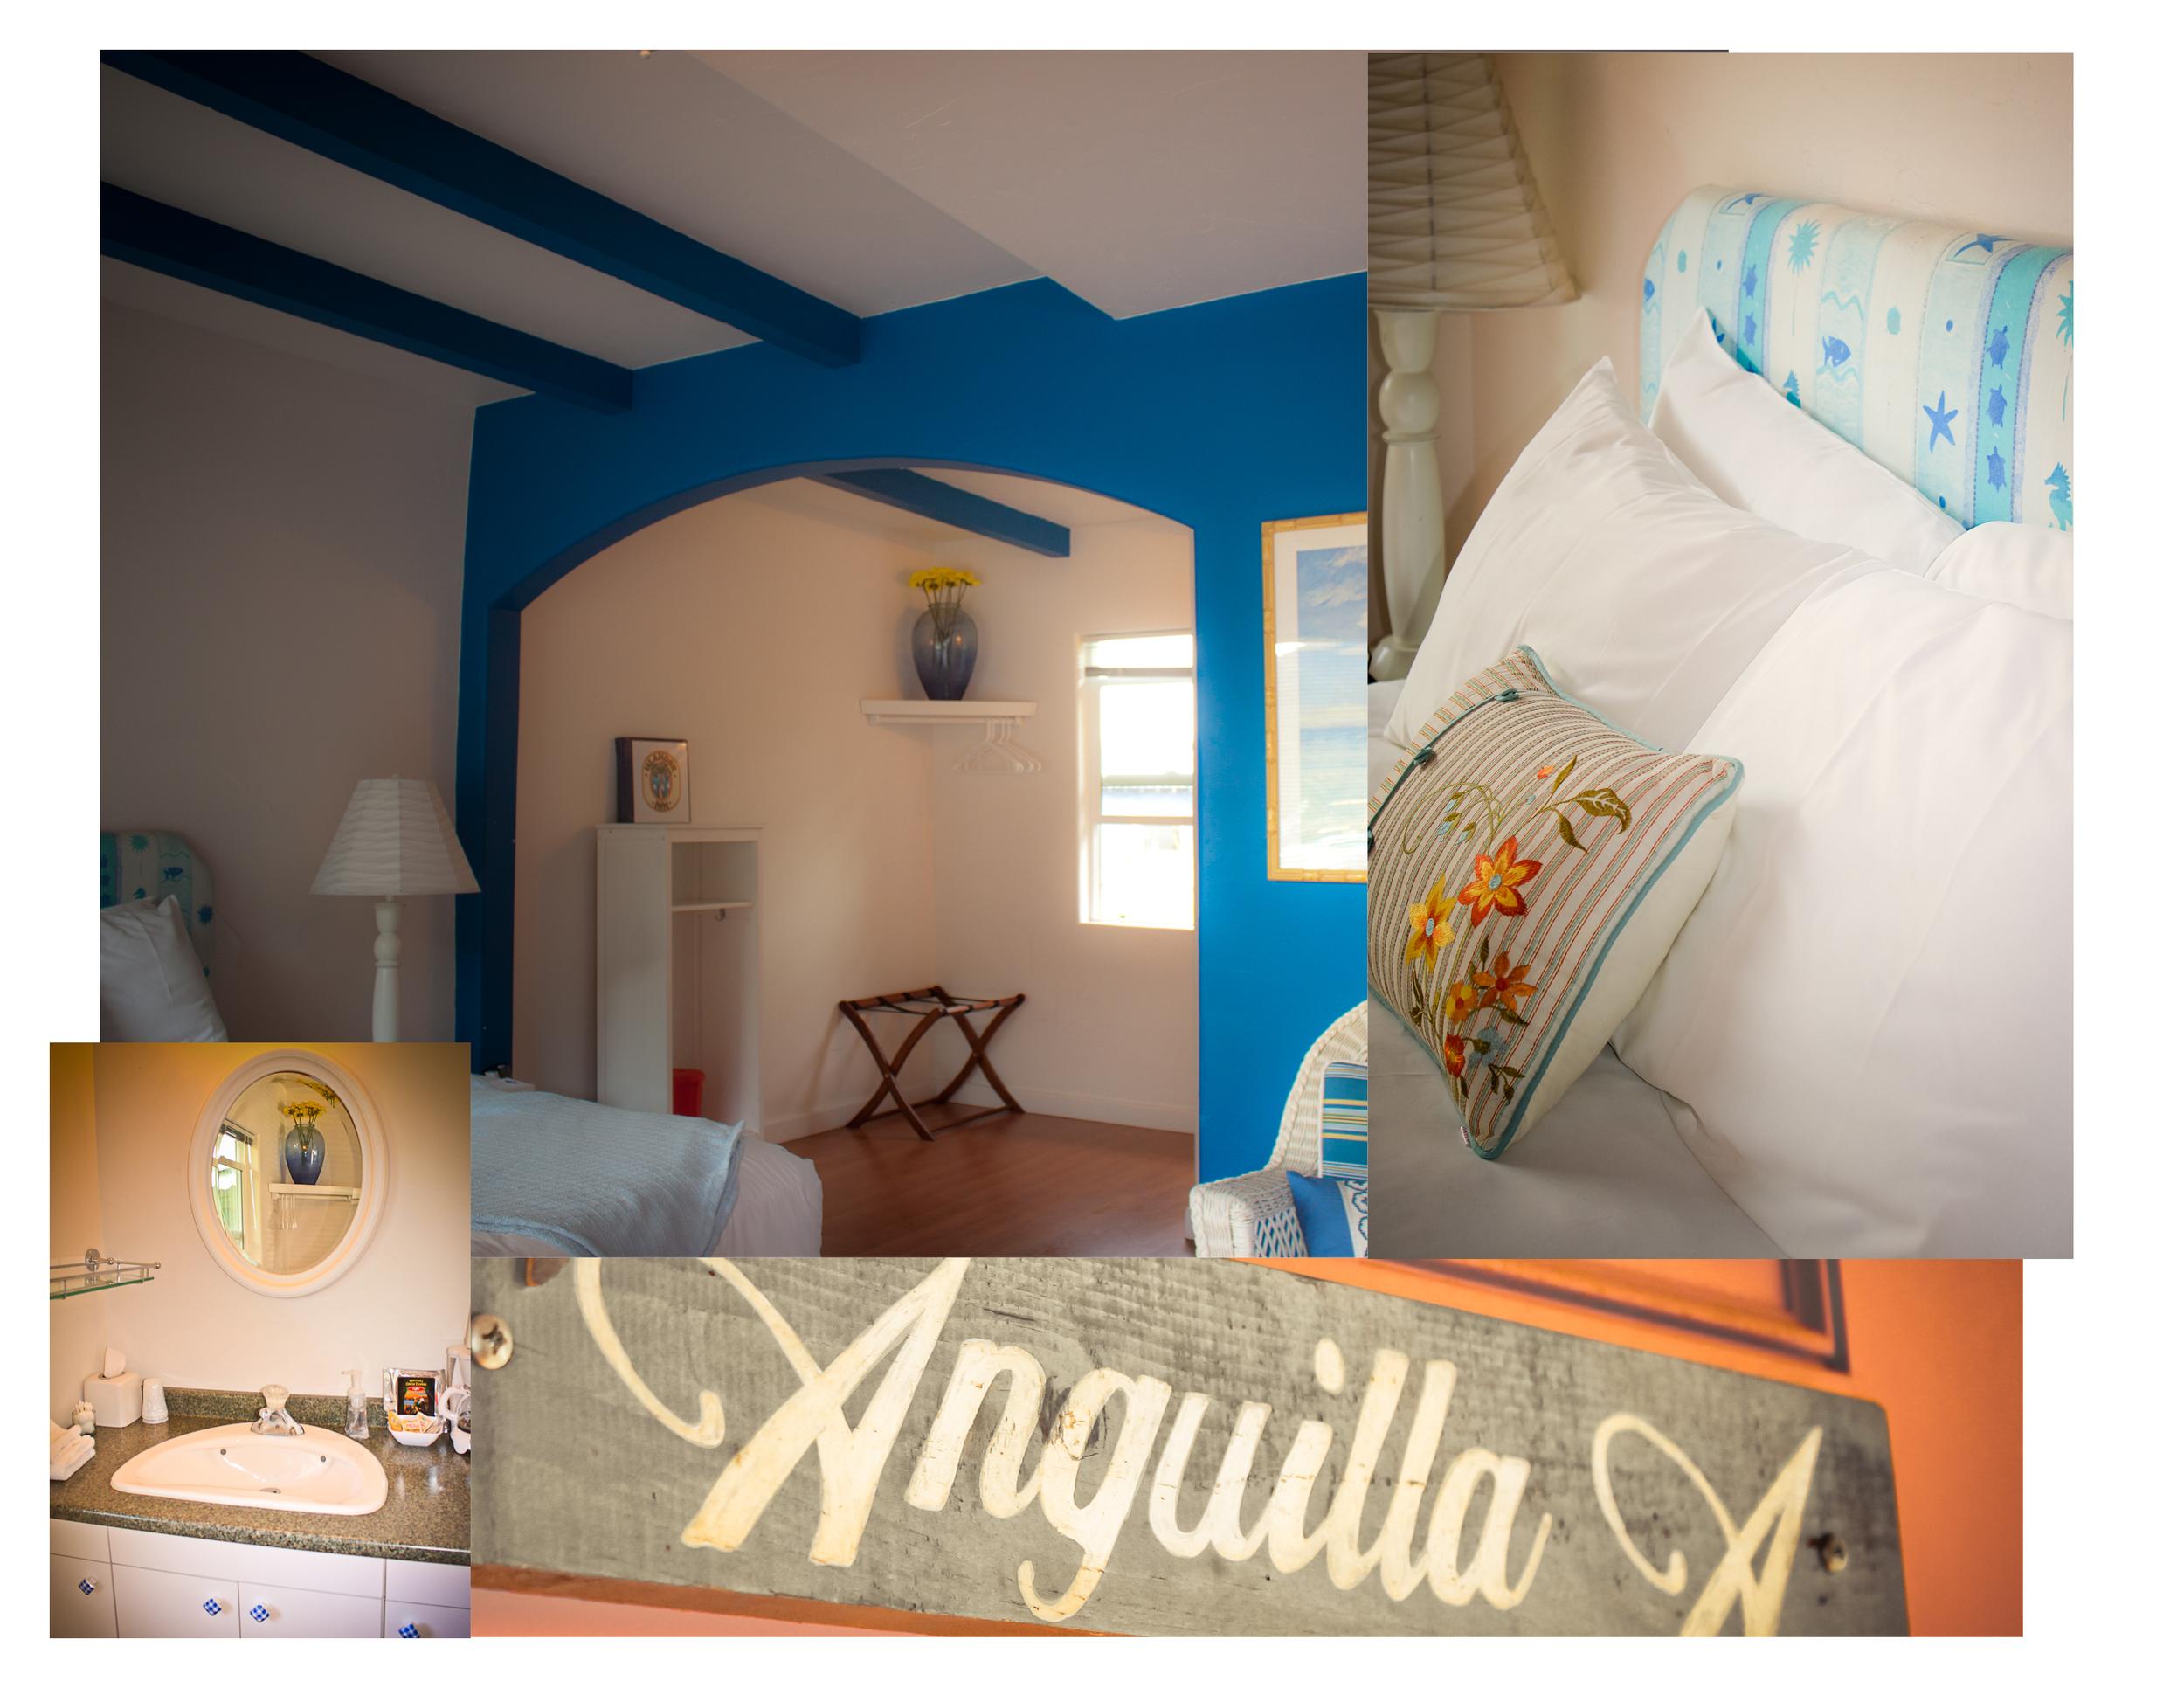 Anguilla A.jpg